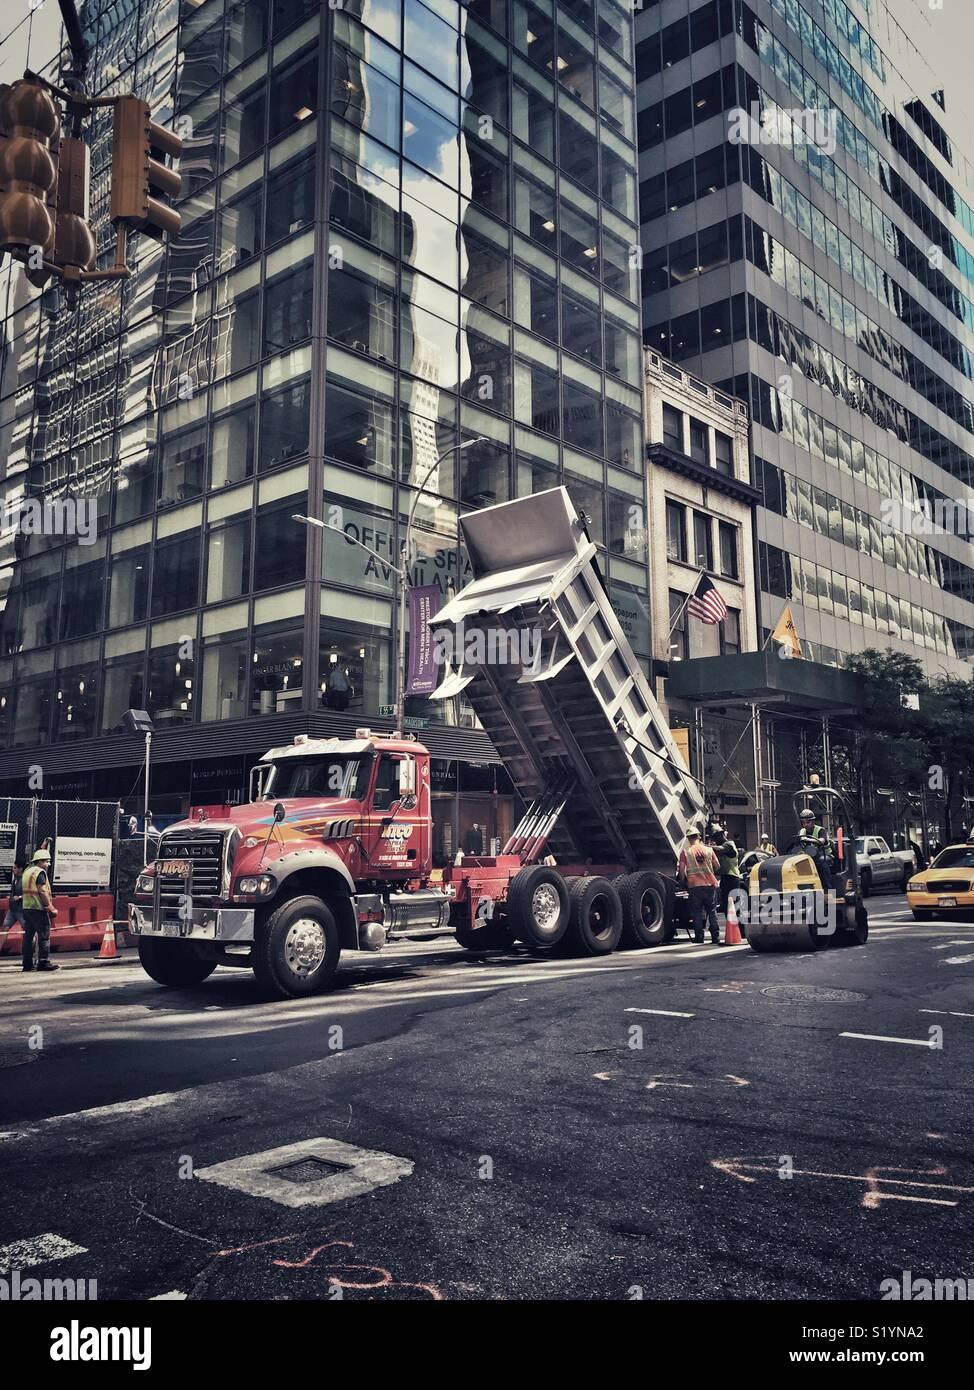 New york, USA, Truck in street. - Stock Image